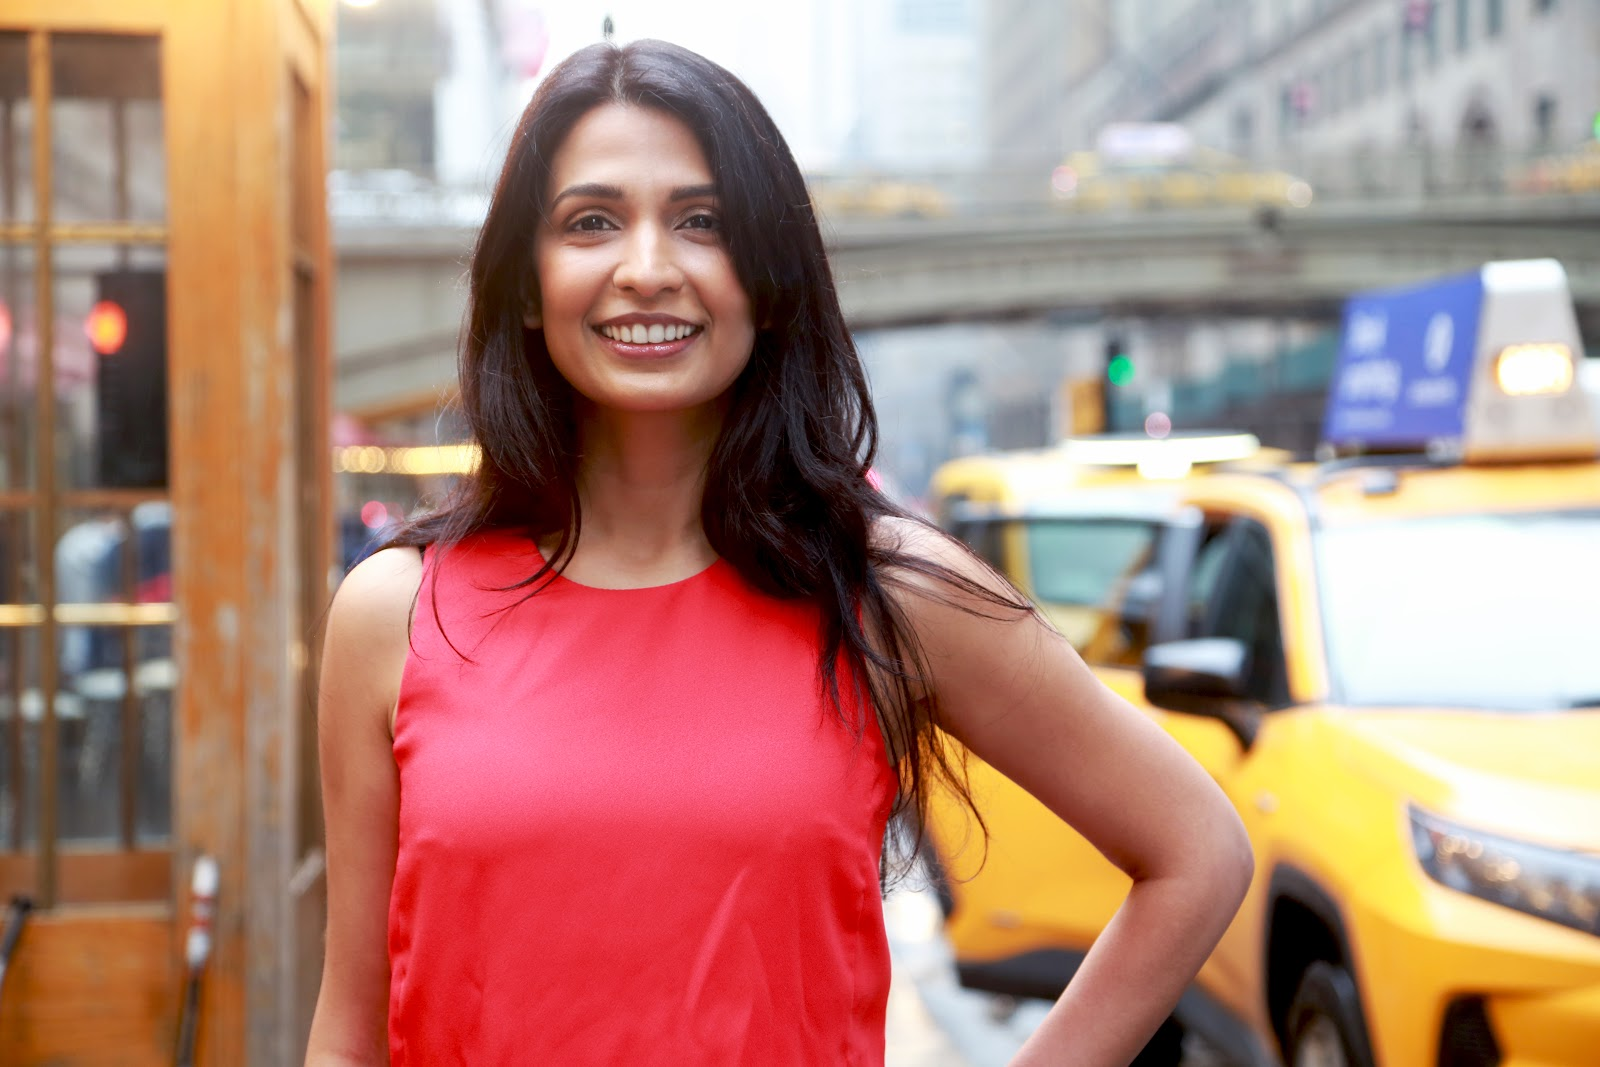 Sonali Nigam founder and CEO of Petminded headshot